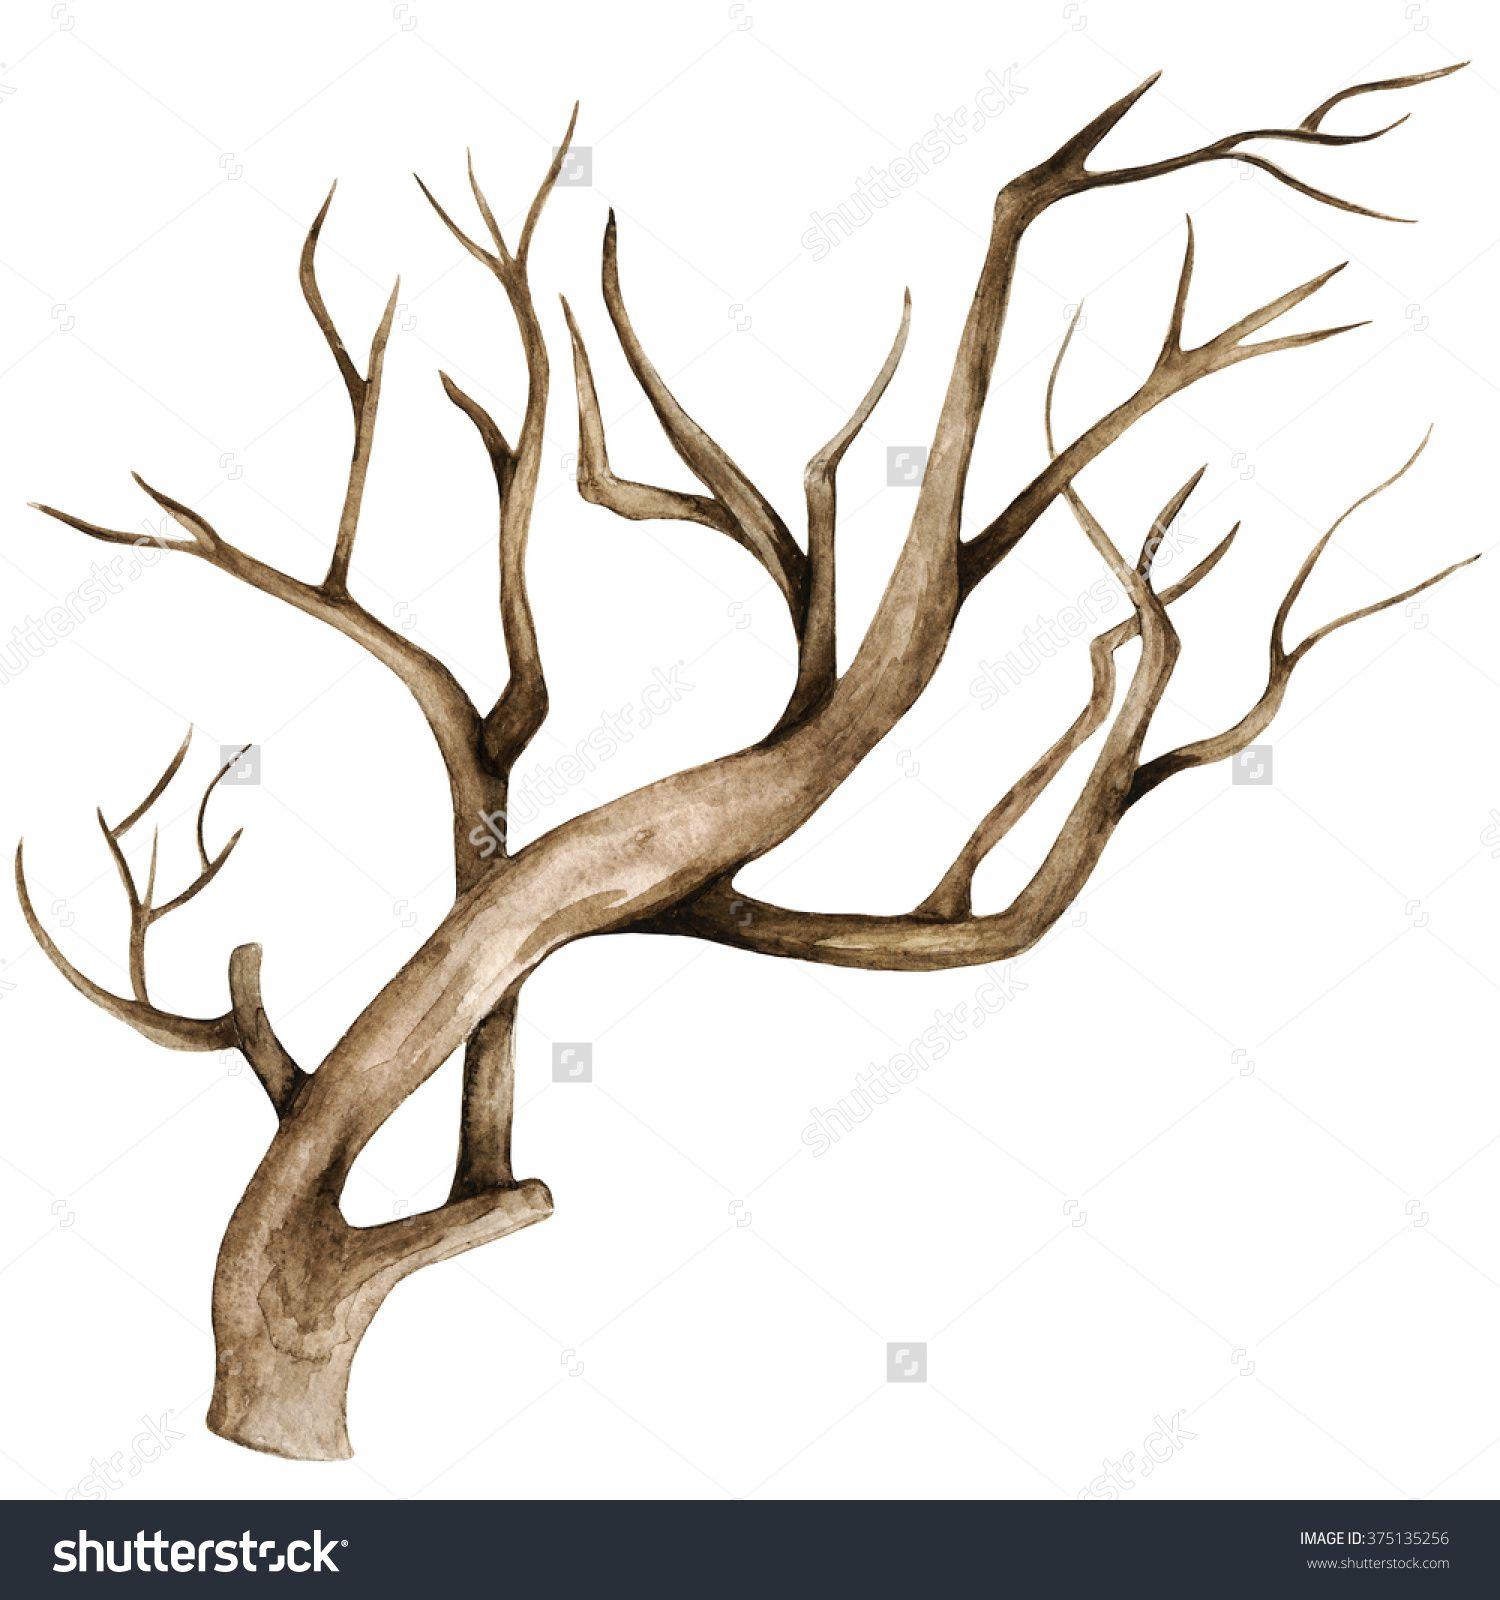 1500x1600 Watercolor Dry Tree, Branch, Bare Tree, Twig, Bough Closeup